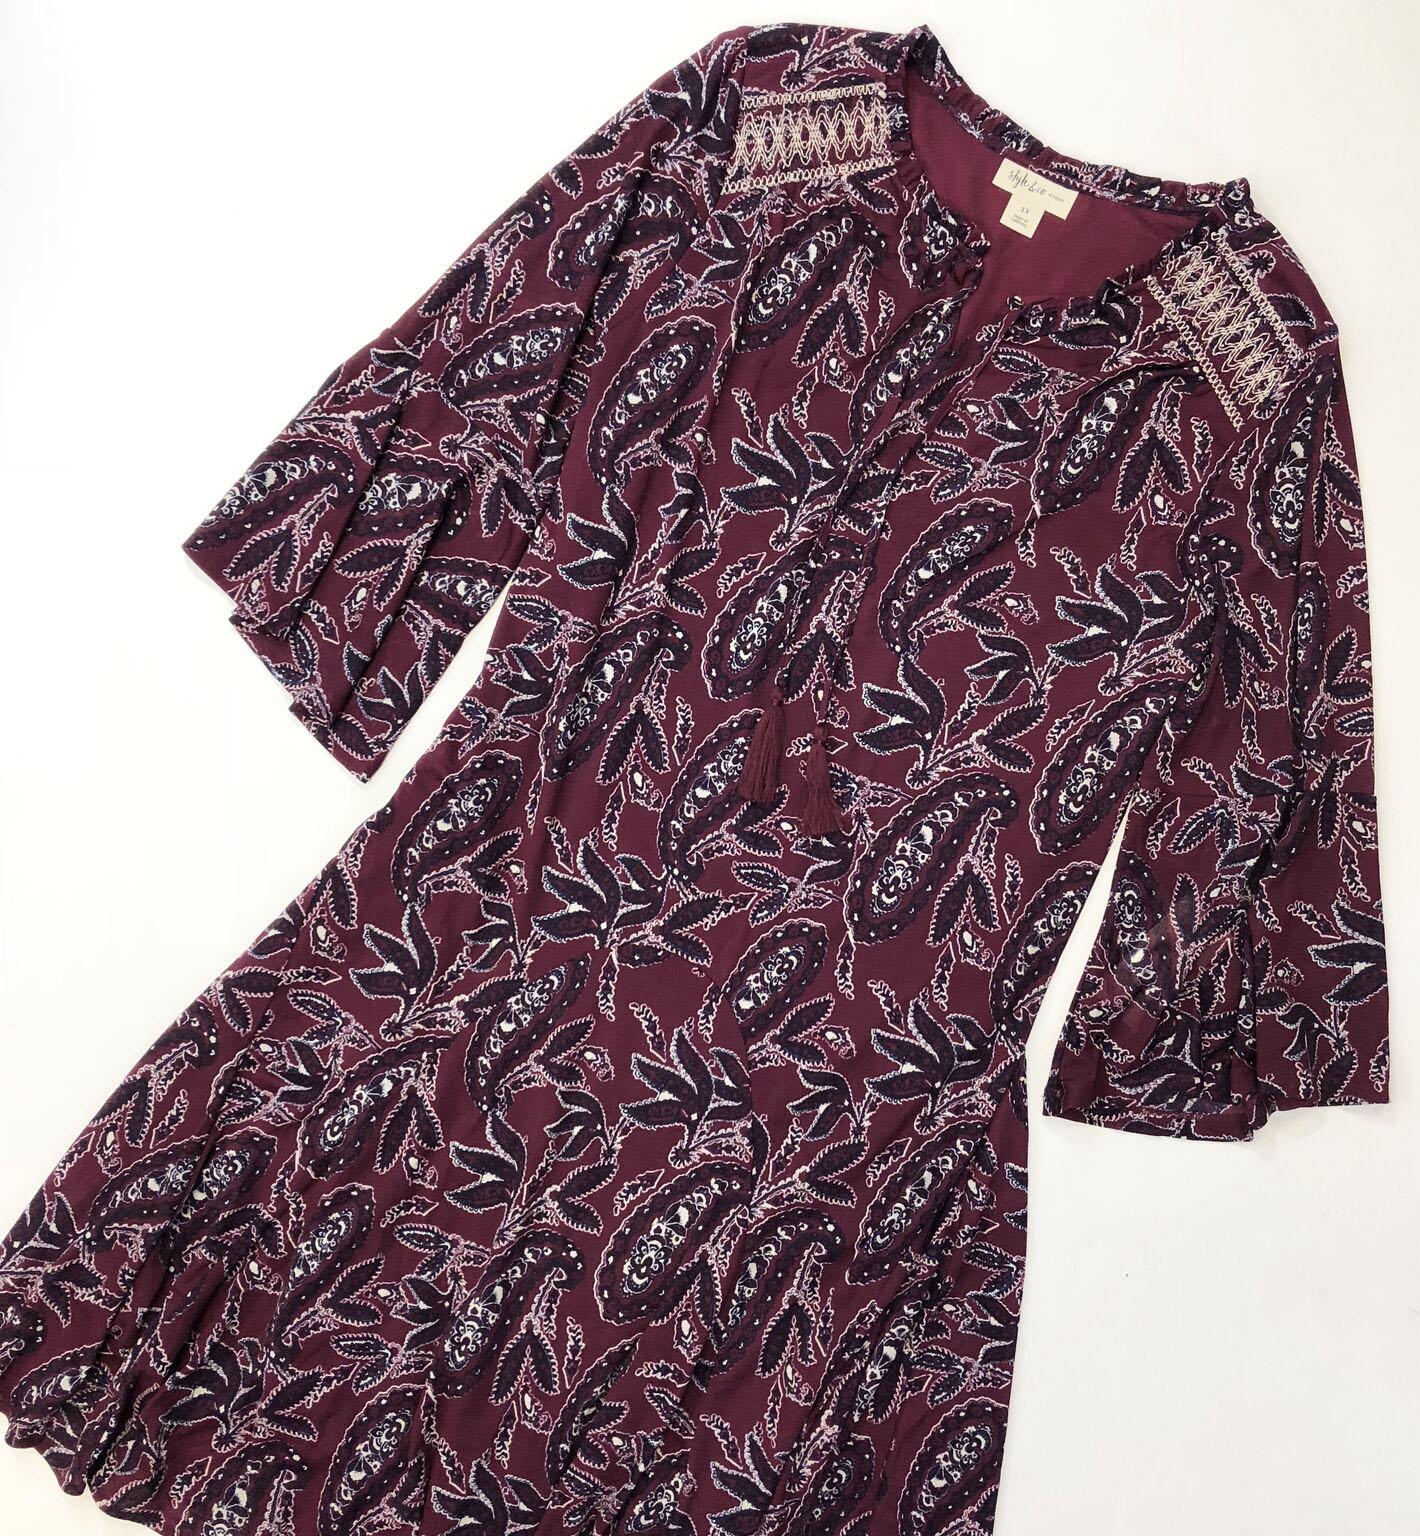 Style & Co Dress – Original Retail: $69, CWS: $20